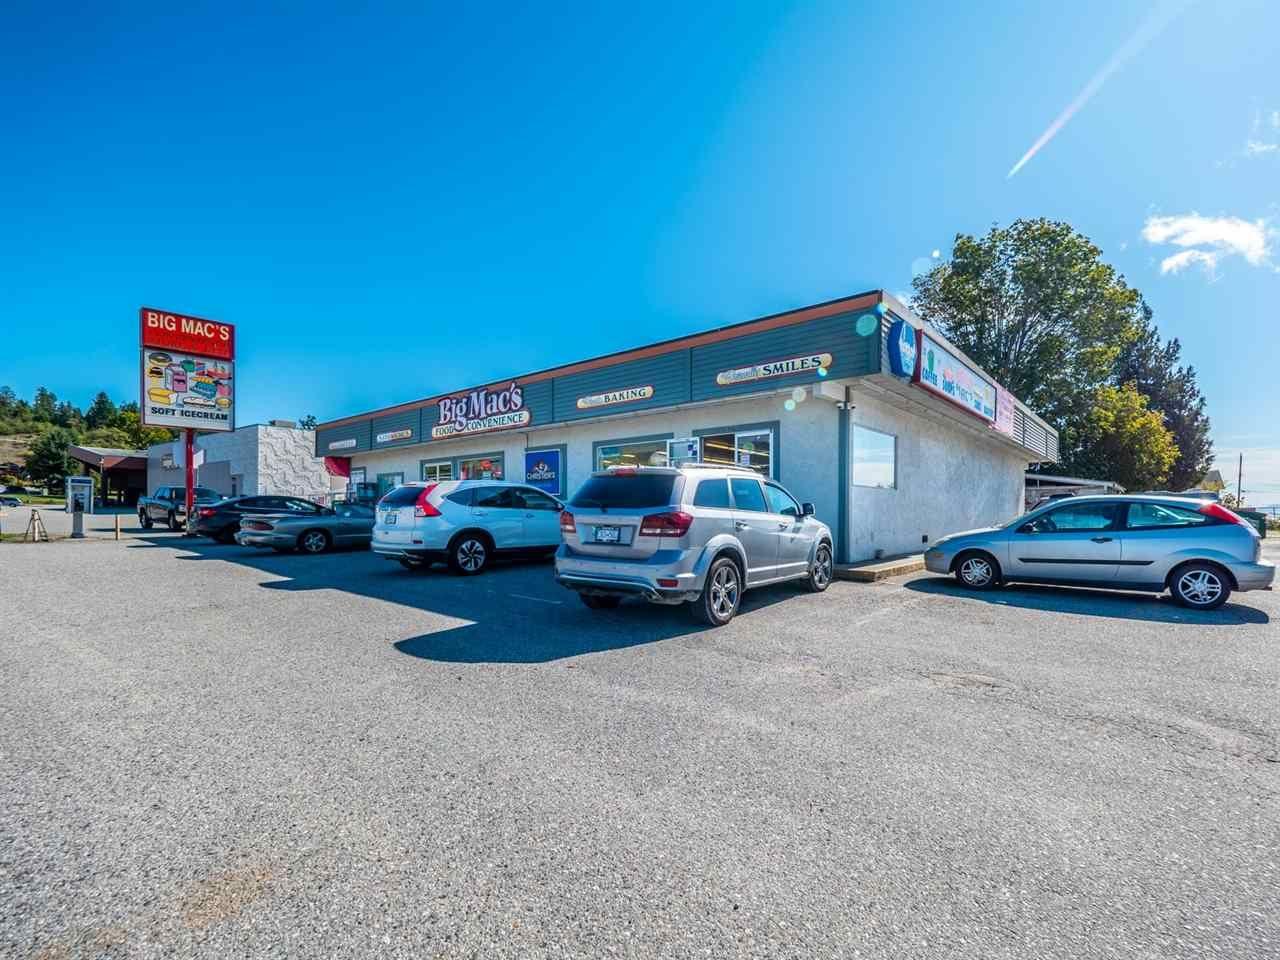 Main Photo: 5583 & 5585 SUNSHINE COAST Highway in Sechelt: Sechelt District Business for sale (Sunshine Coast)  : MLS®# C8038330